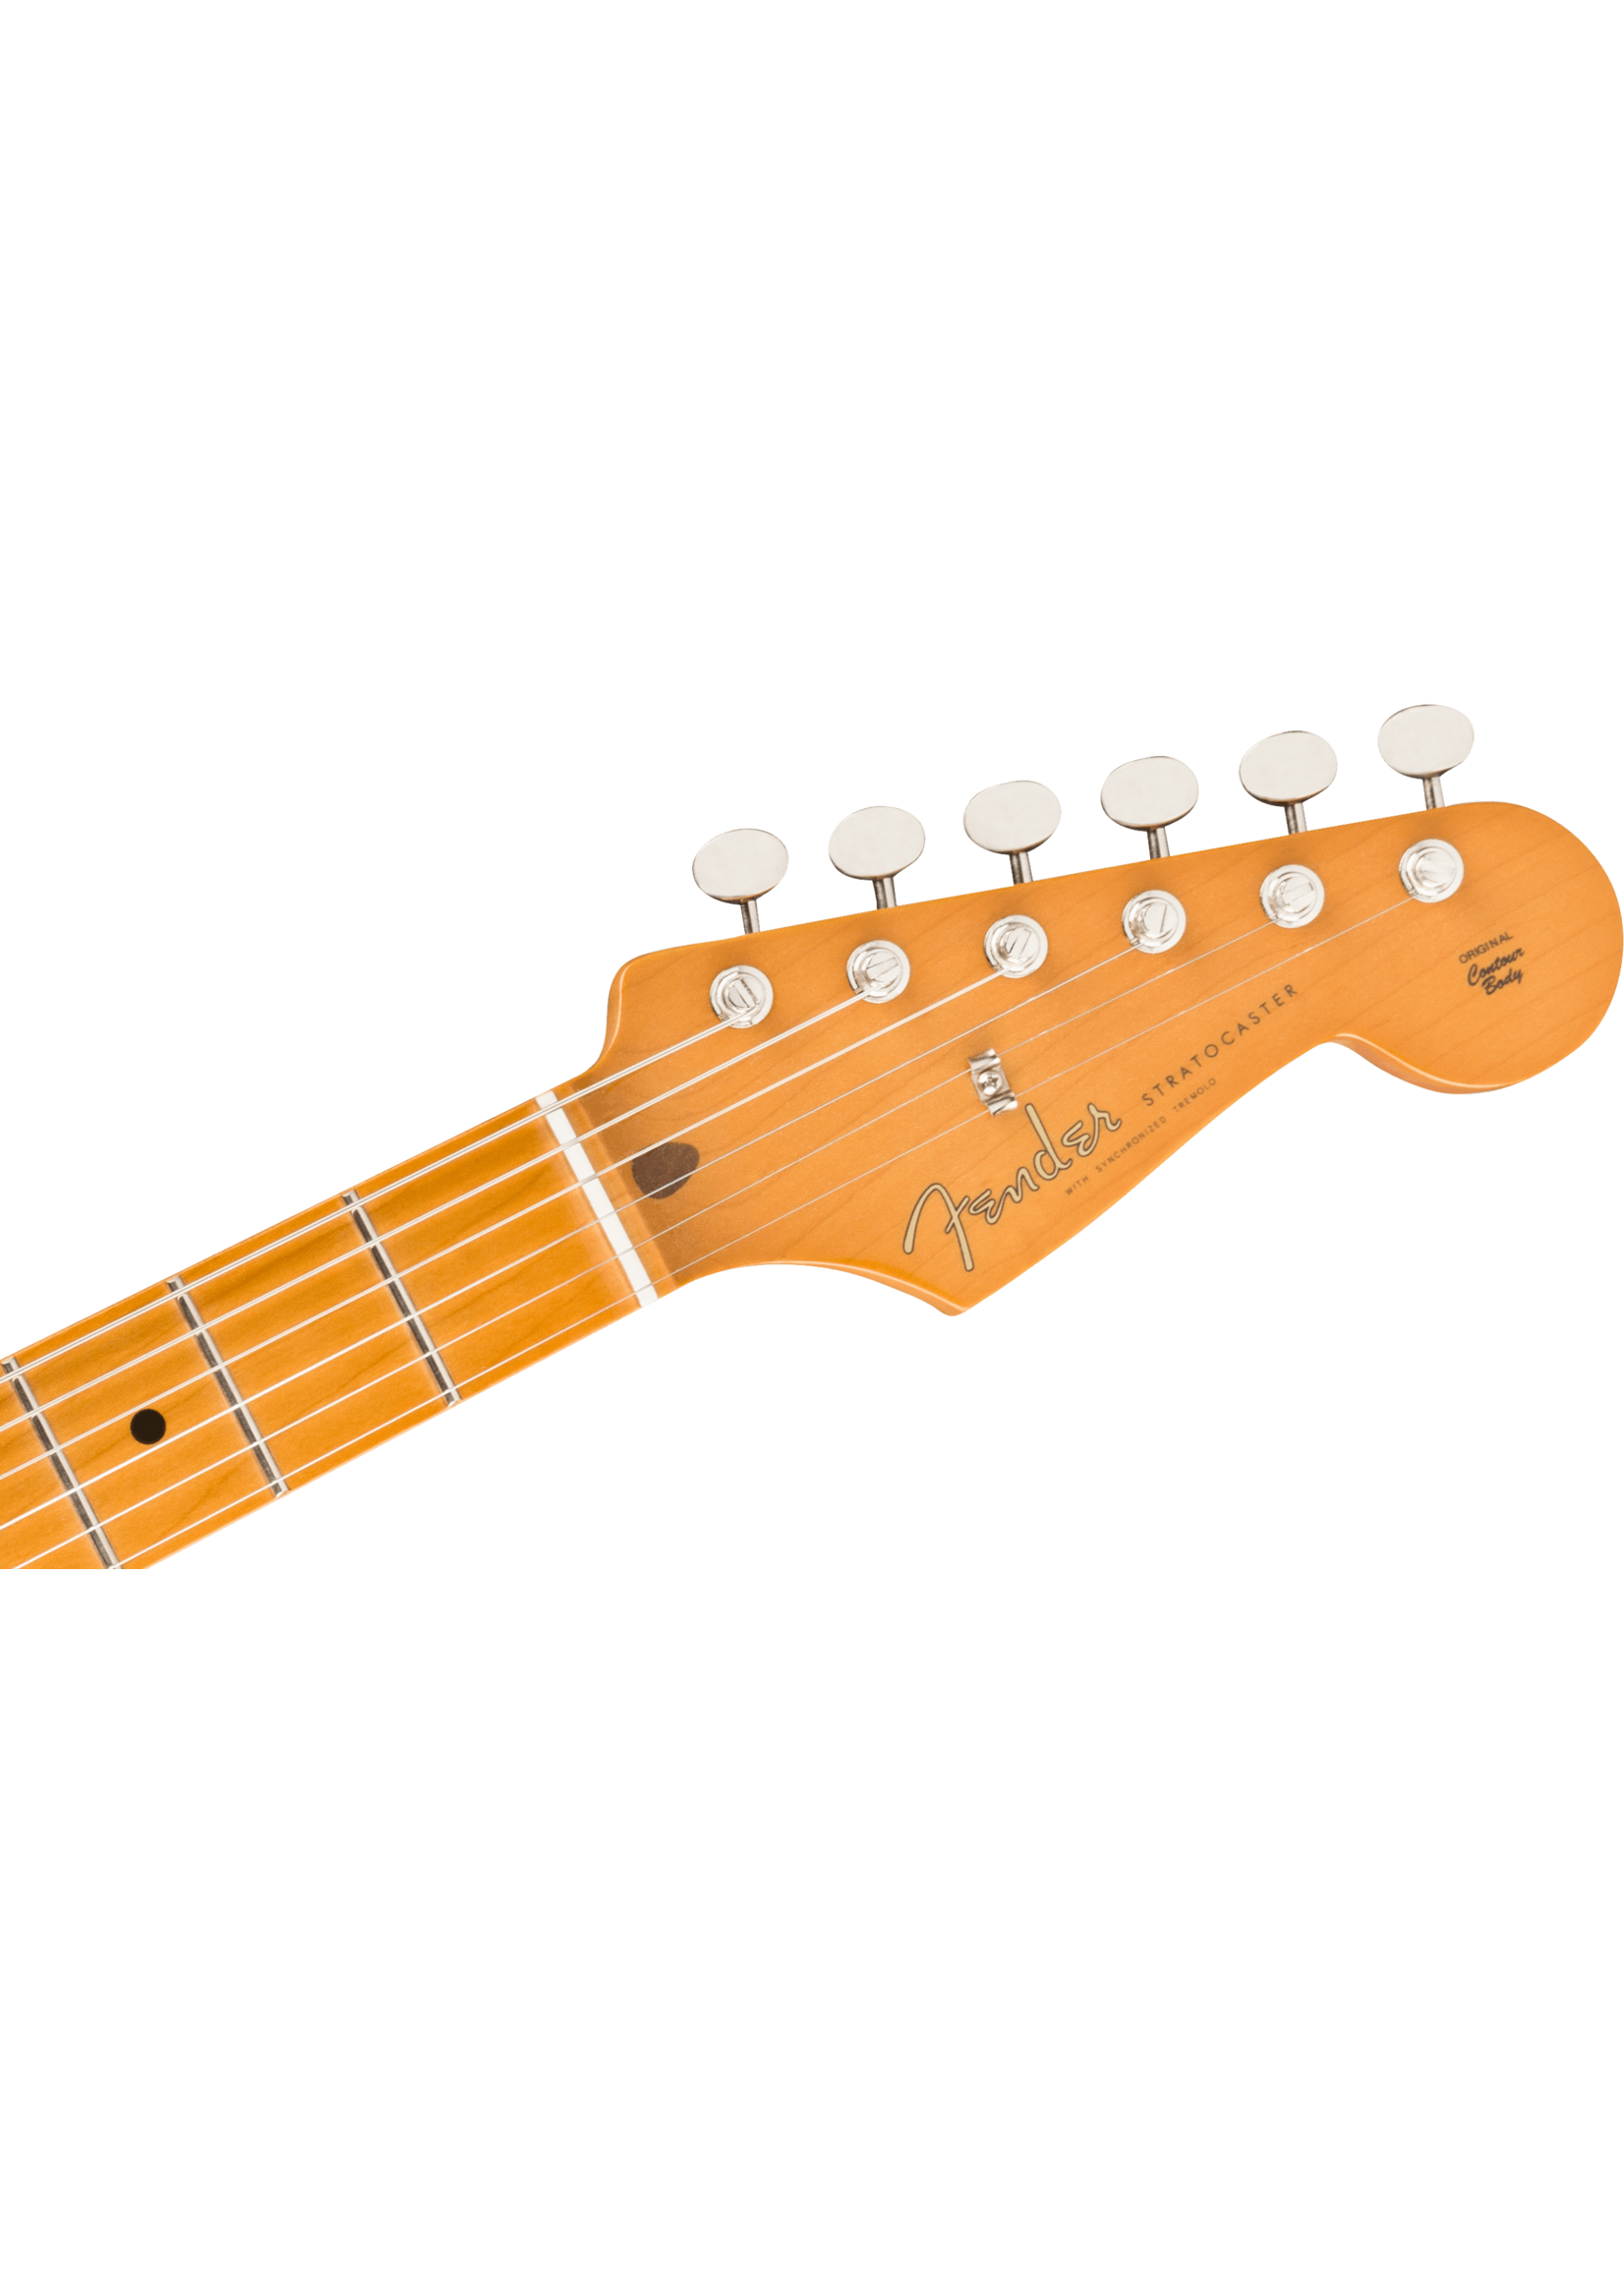 Fender Fender Vintera '50s Stratocaster Modified with Maple Fretboard 2-Color Sunburst